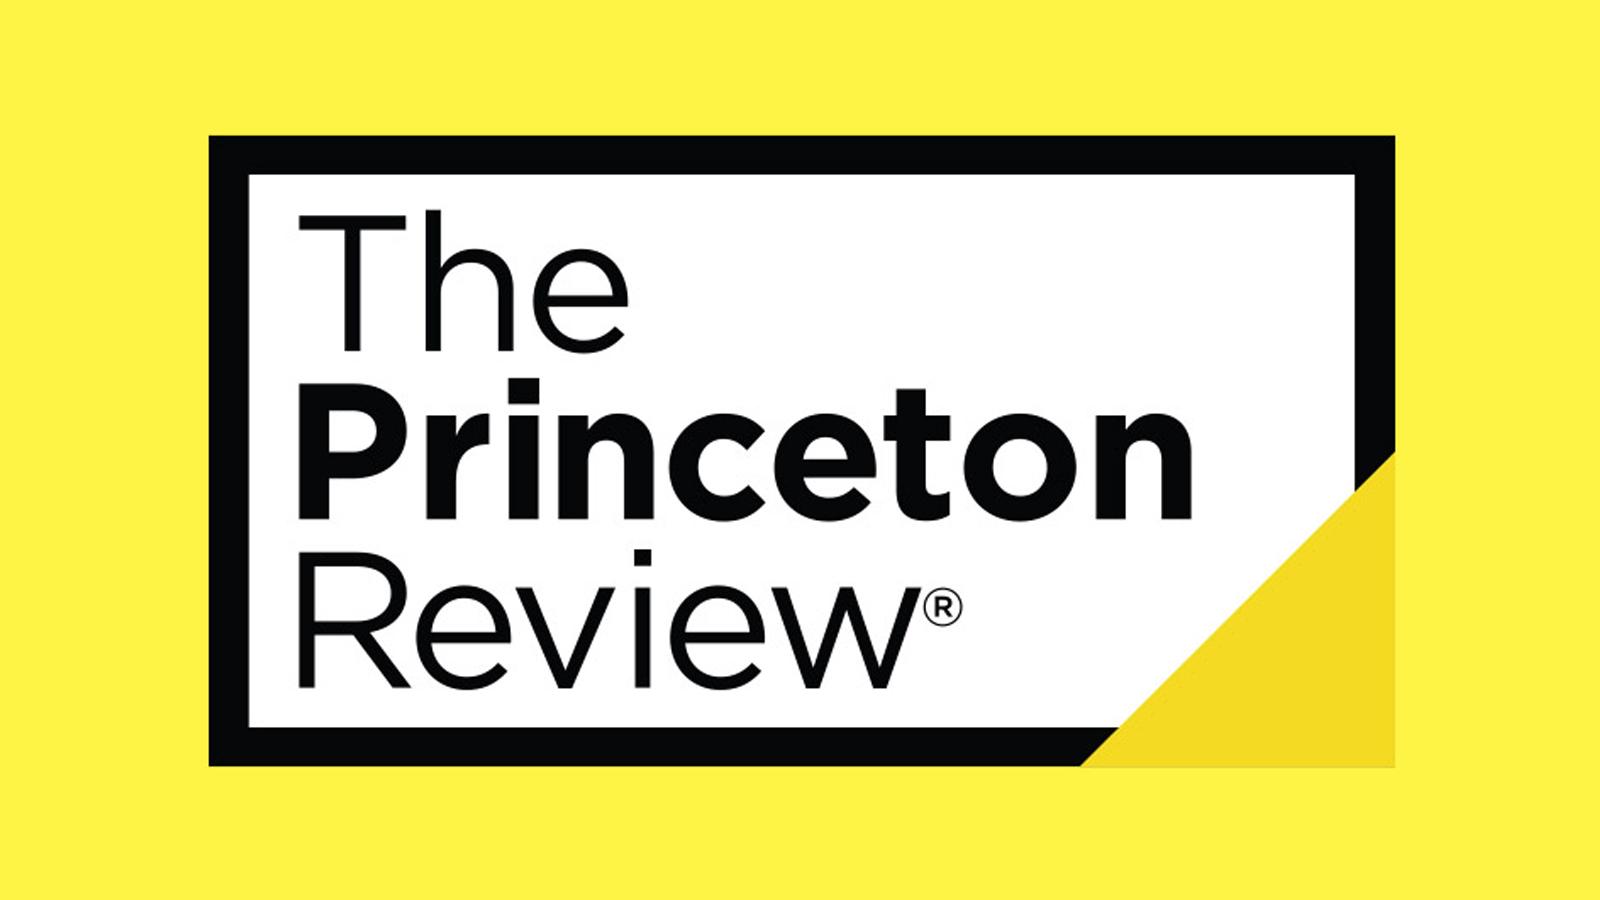 The Princeton Review Logo